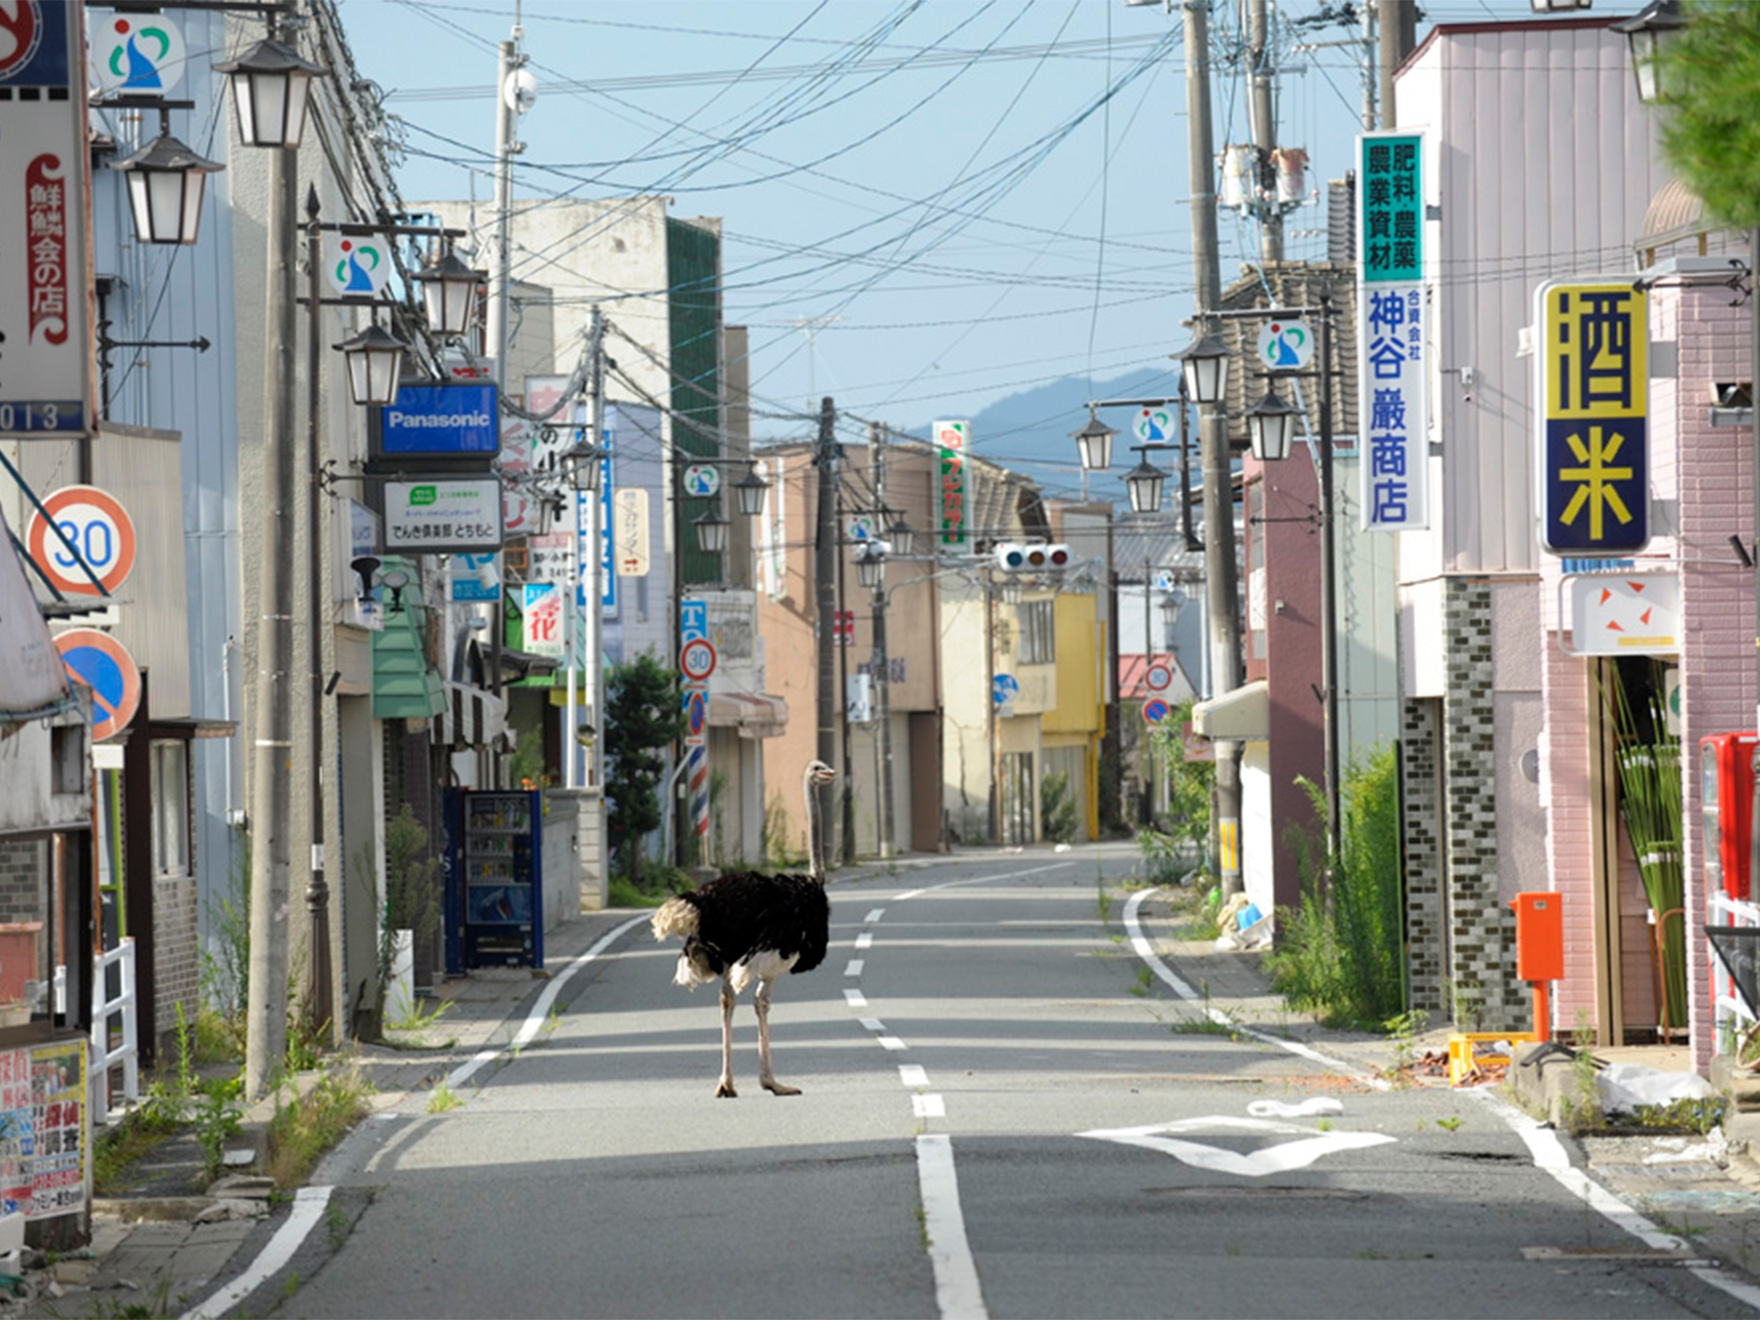 Yasusuke Ōta, Deserted Town from the series The Abandoned Animals of Fukushima, 2011